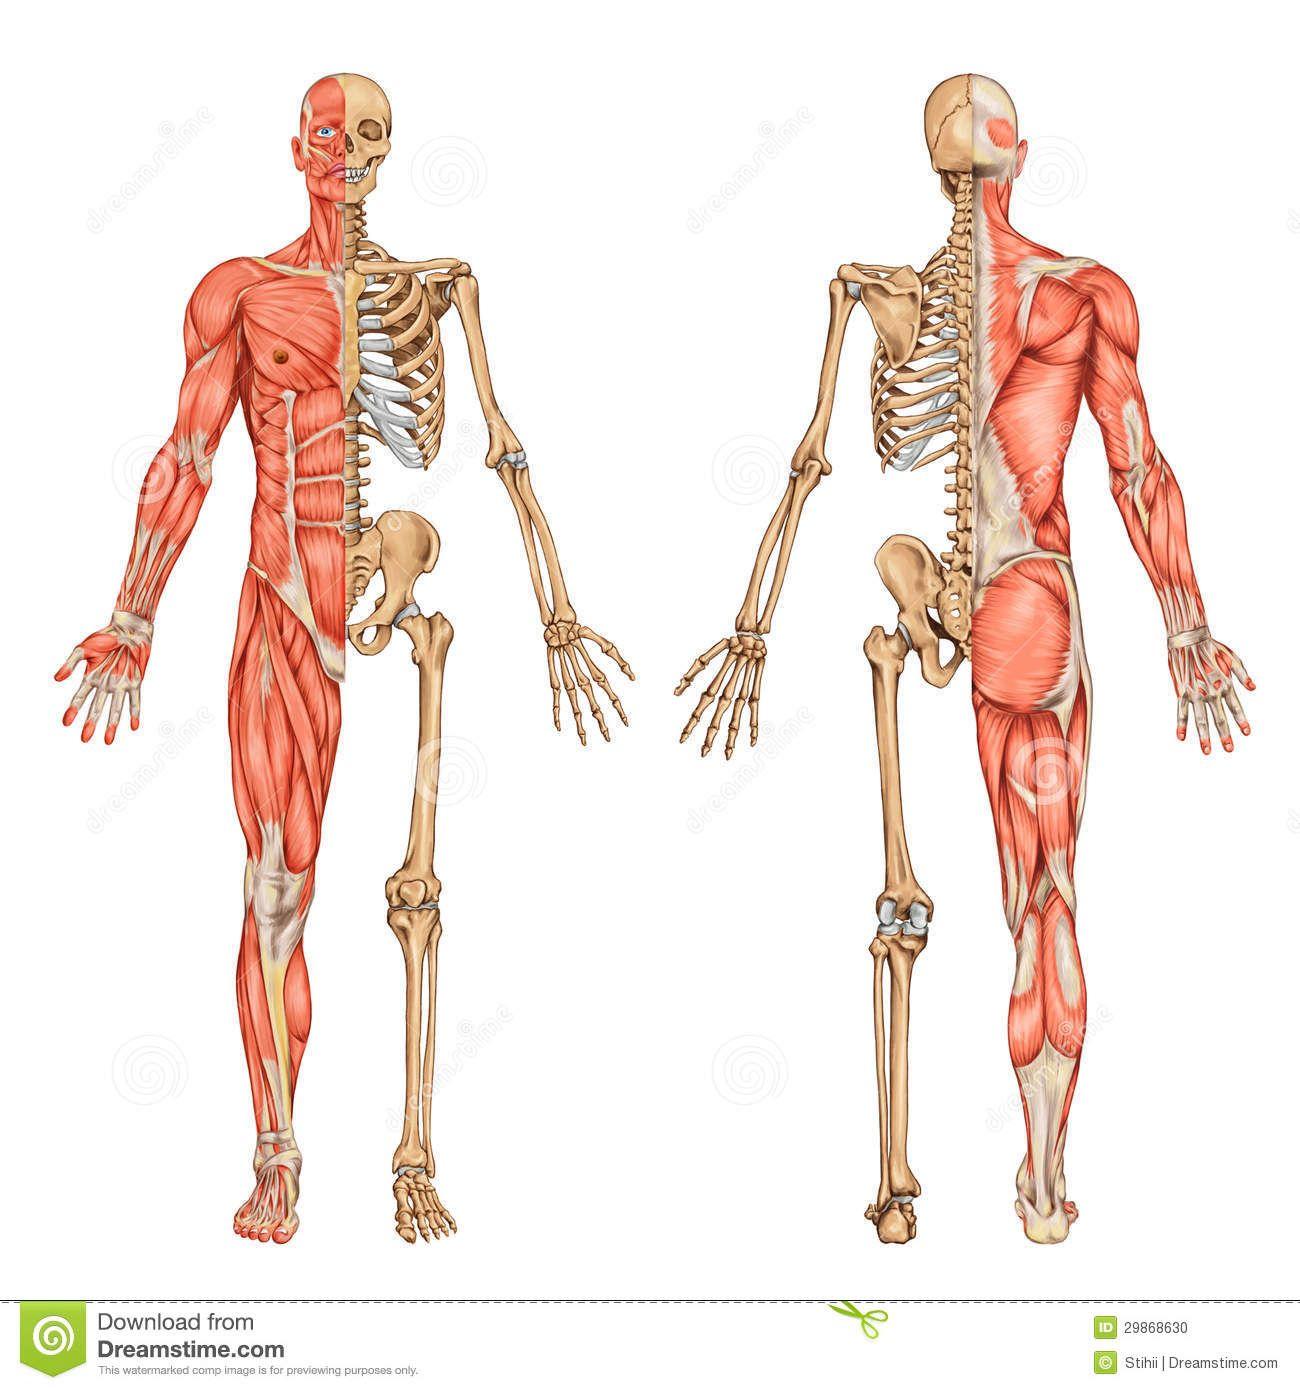 human-skeleton-posterior-anterior-view-didactic-board-anatomy-human-bony-muscular-system-29868630.jpg (1300×1390)